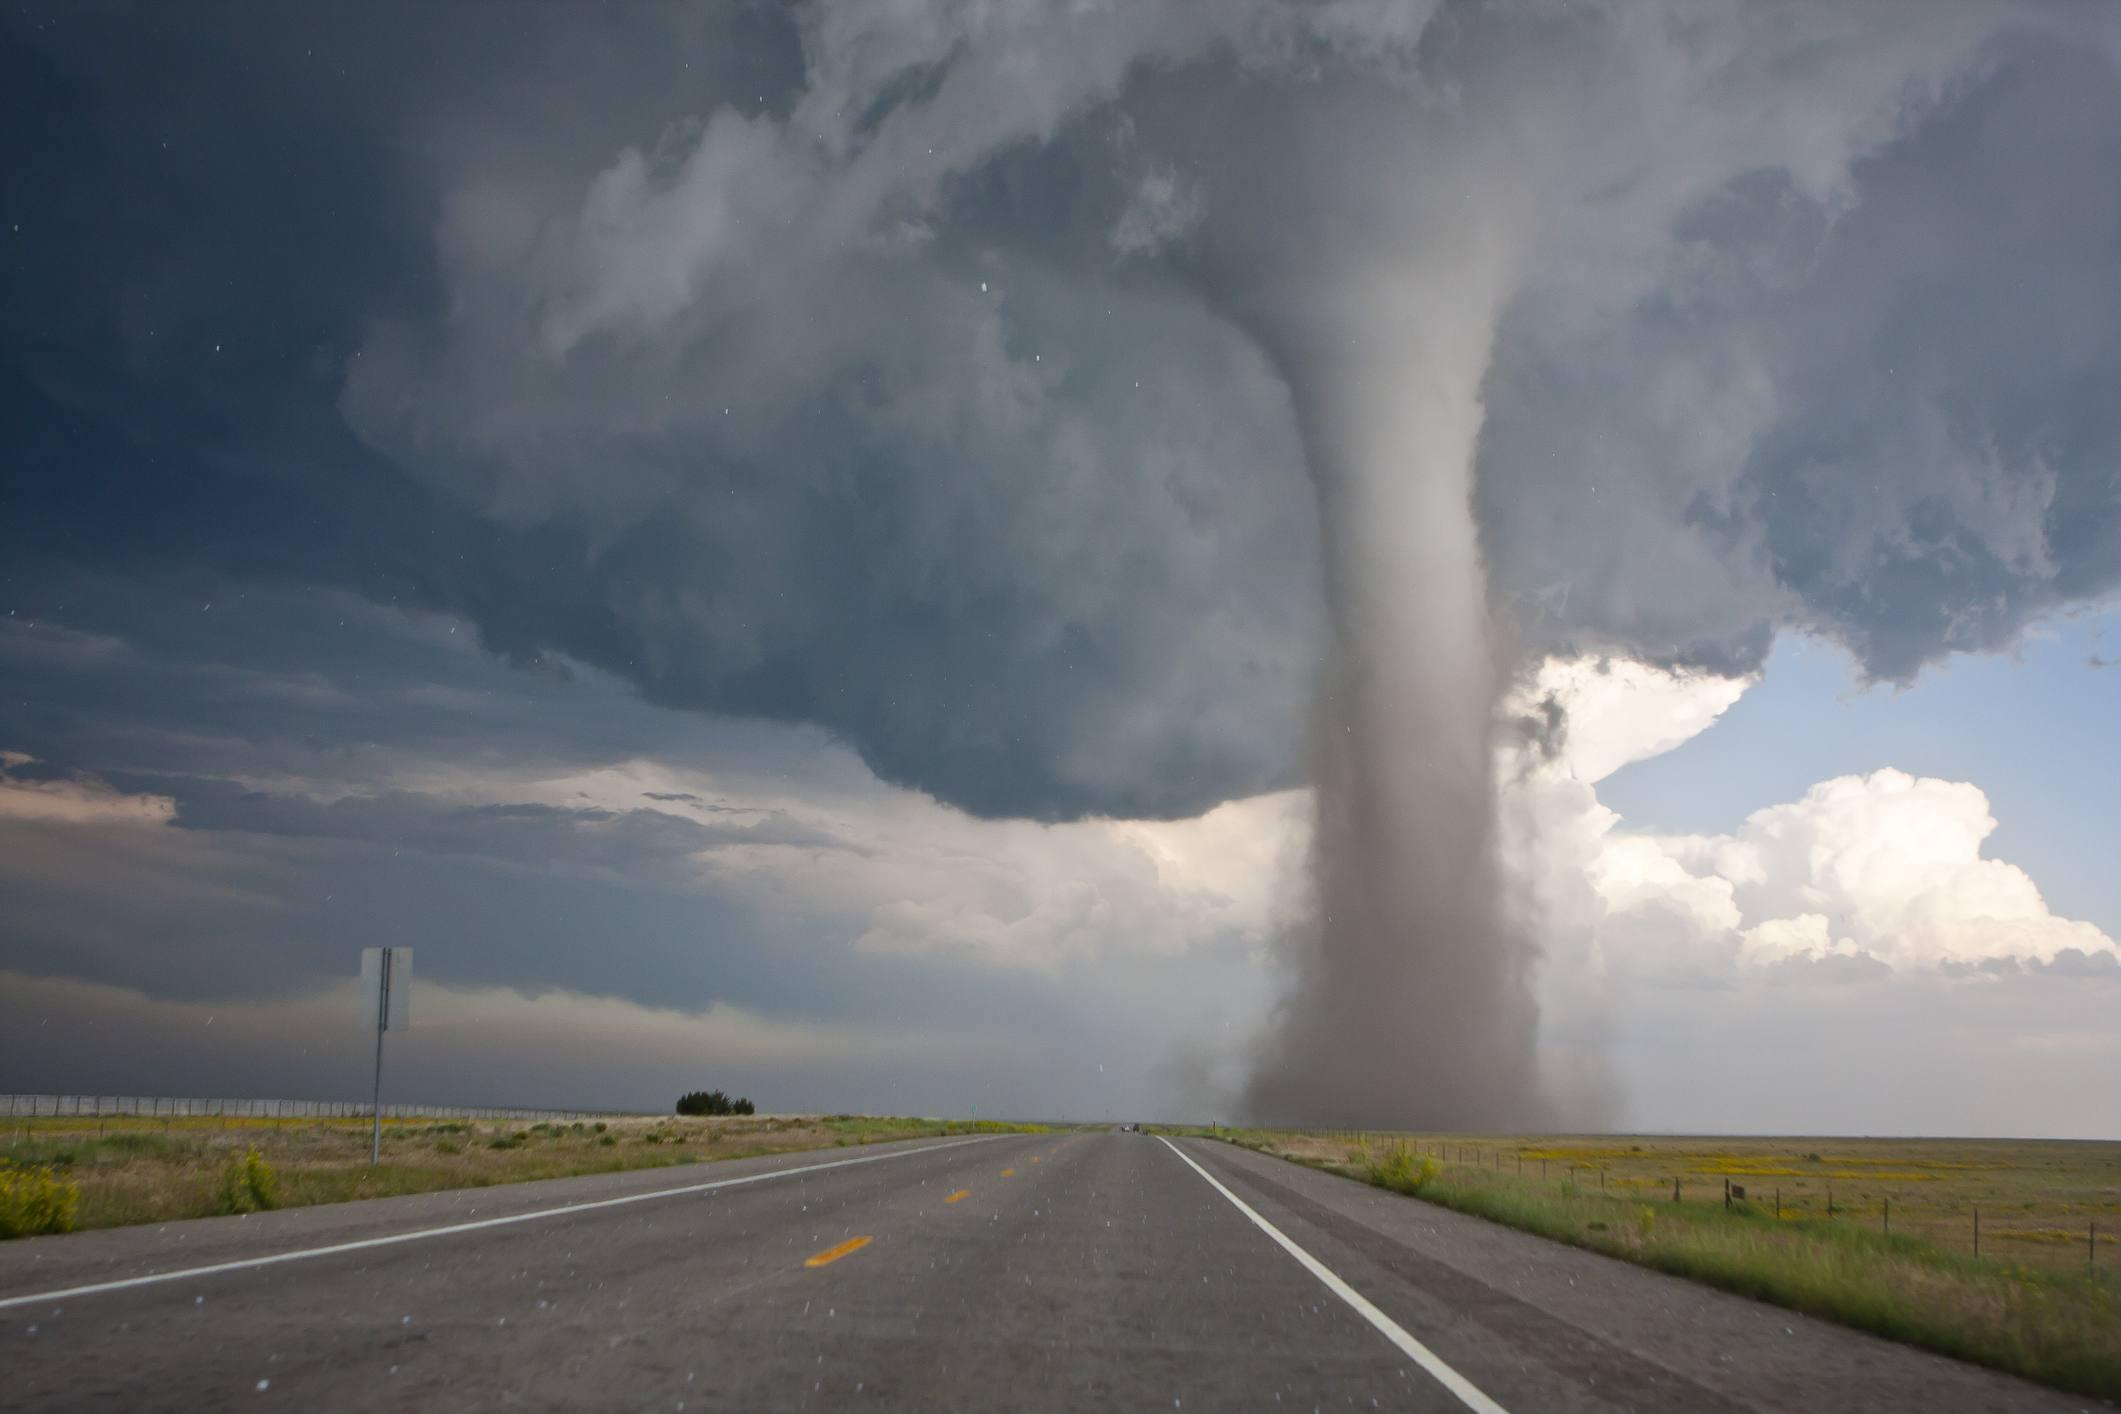 Baca / Campo tornado - stock photo